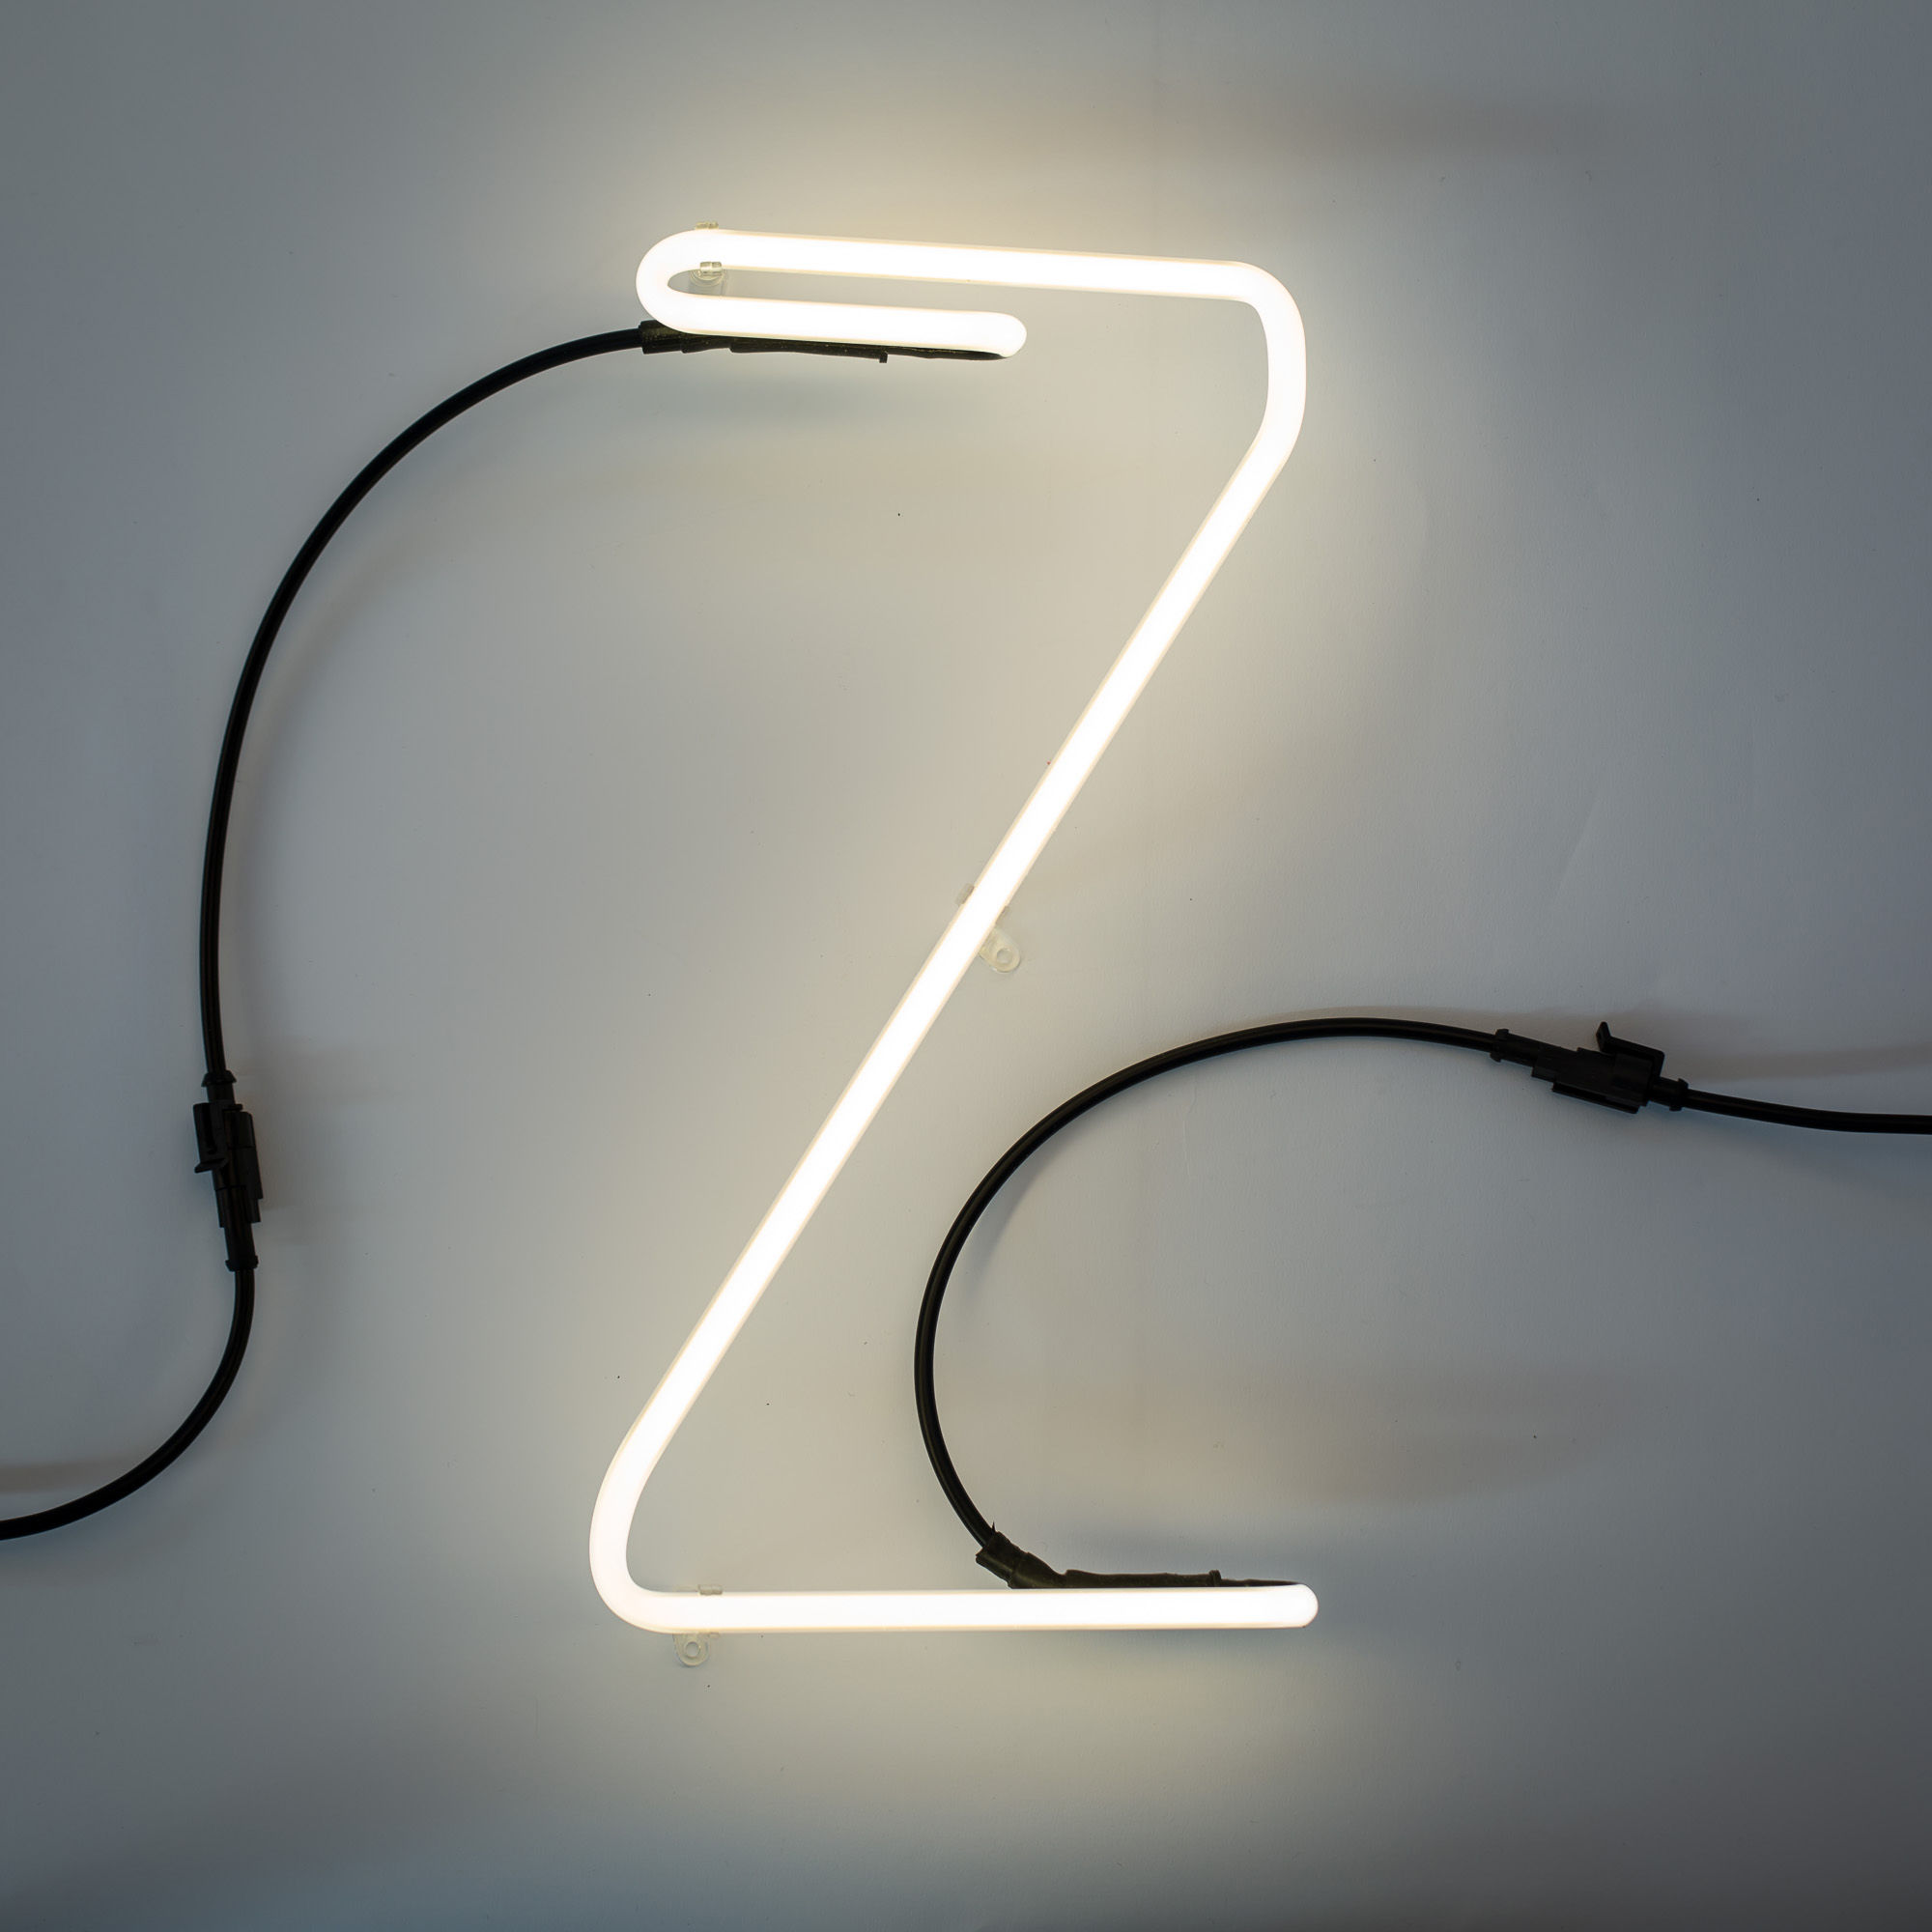 applique n on alphafont lettre z lettre z seletti. Black Bedroom Furniture Sets. Home Design Ideas